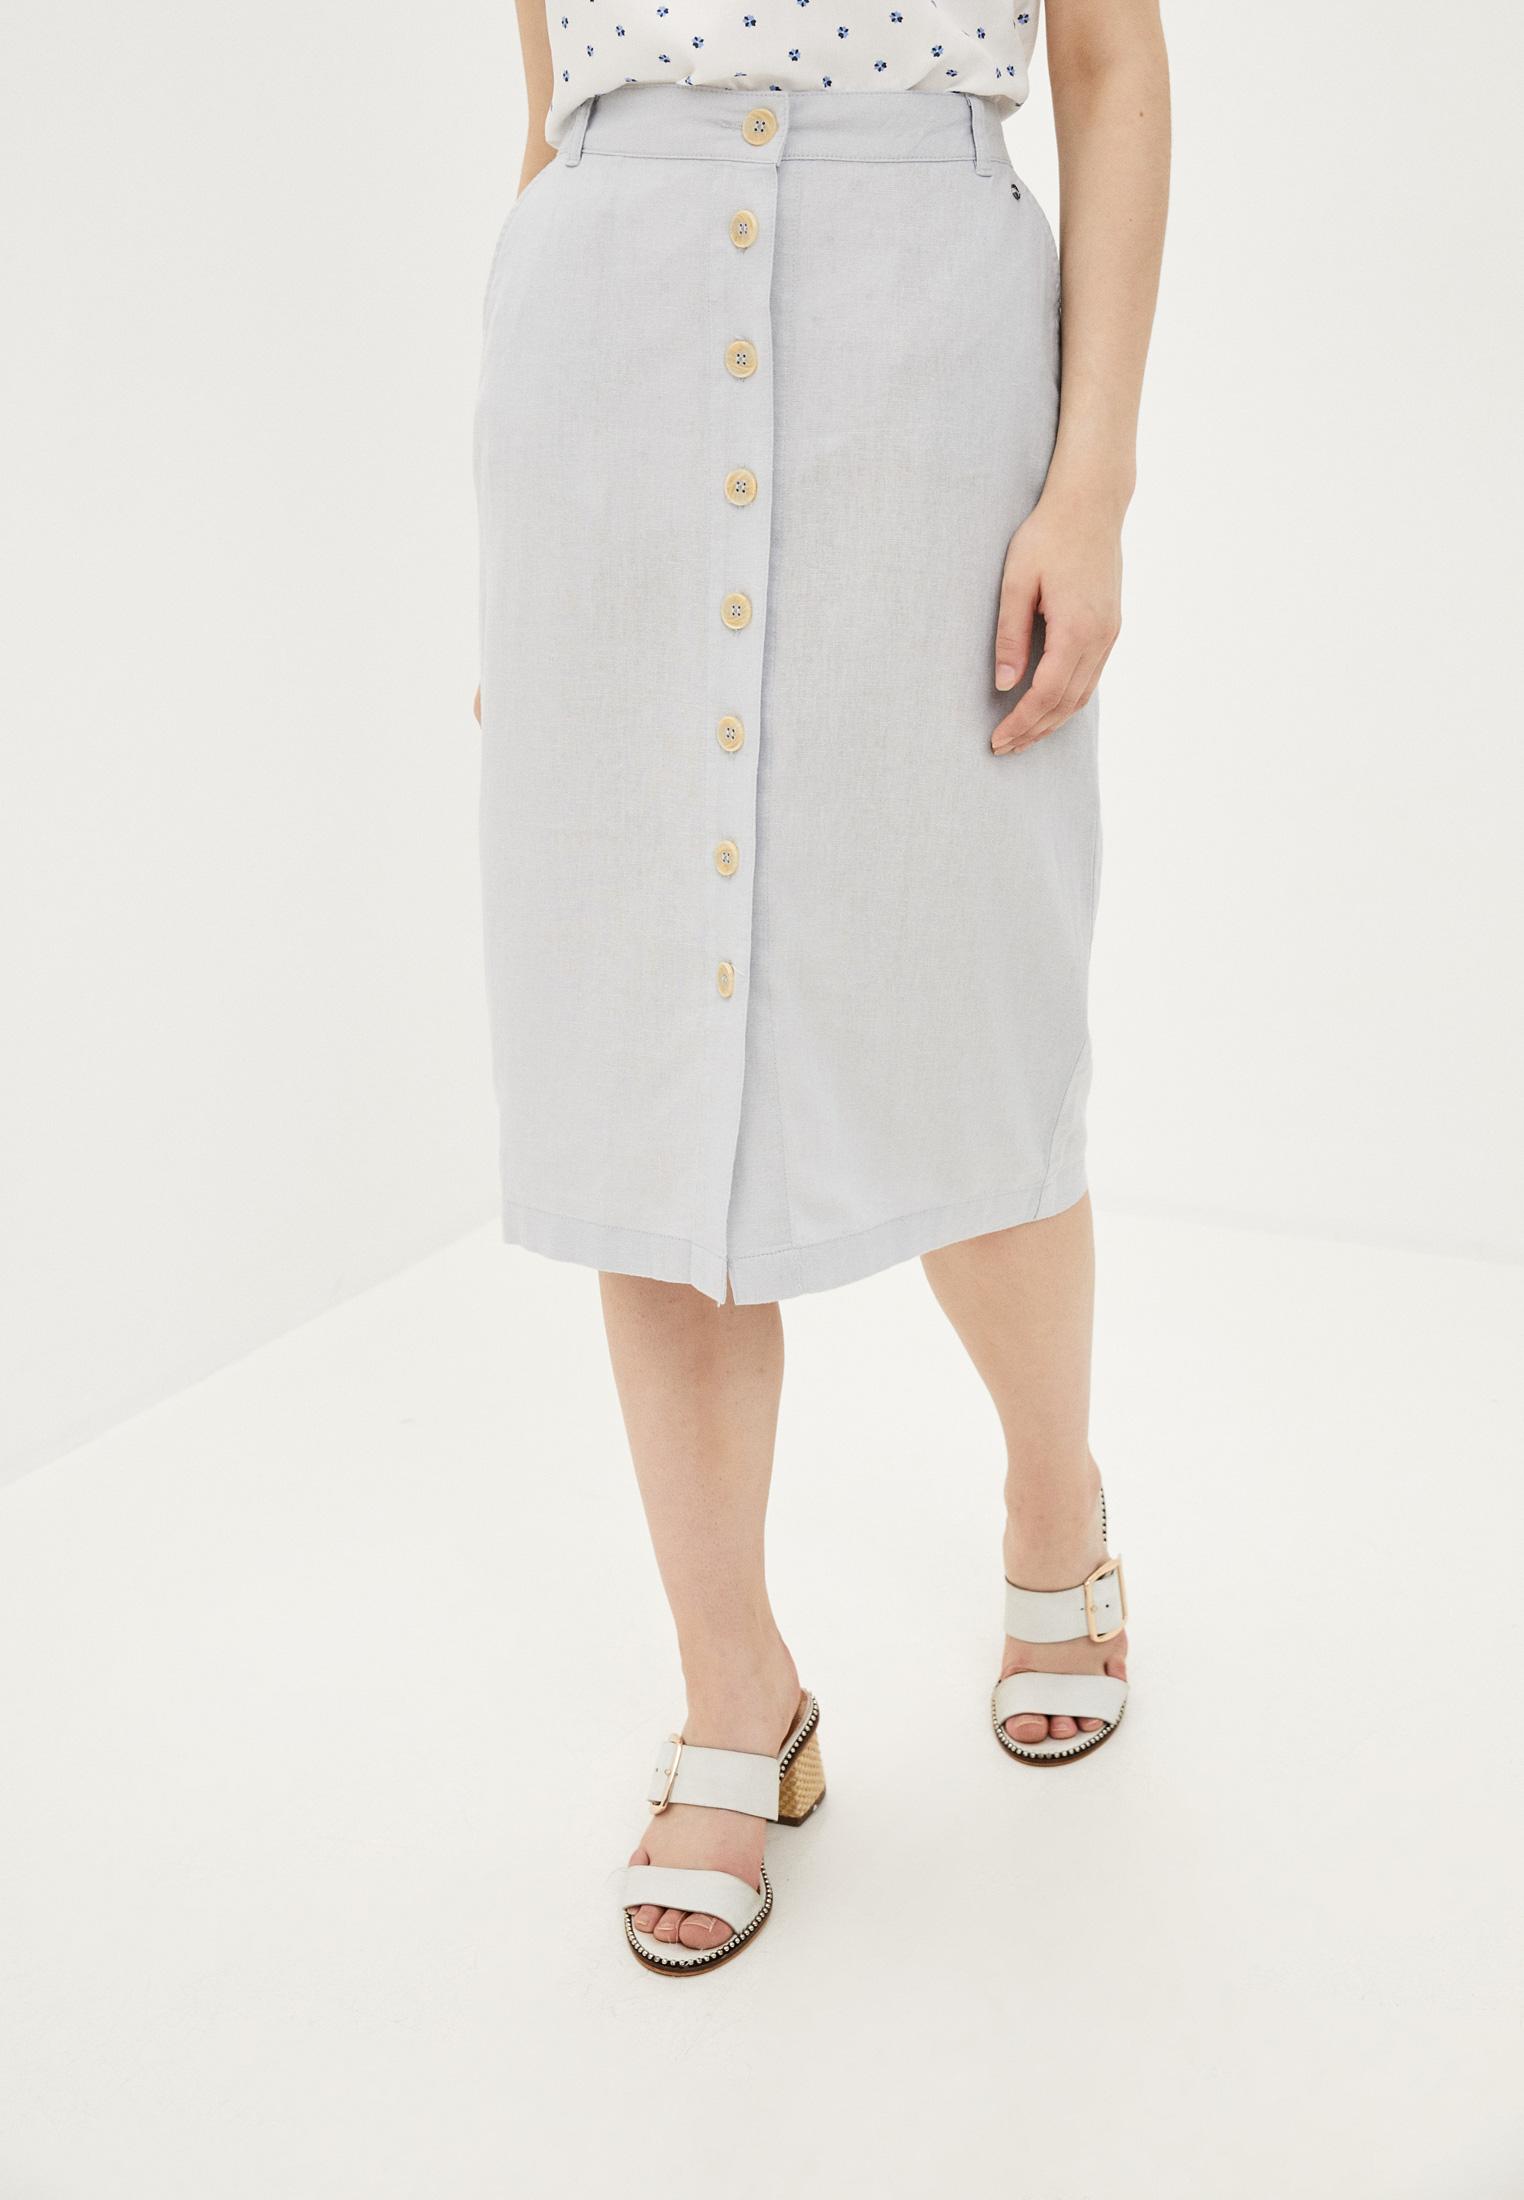 Прямая юбка Finn Flare (Фин Флаер) S19-14081